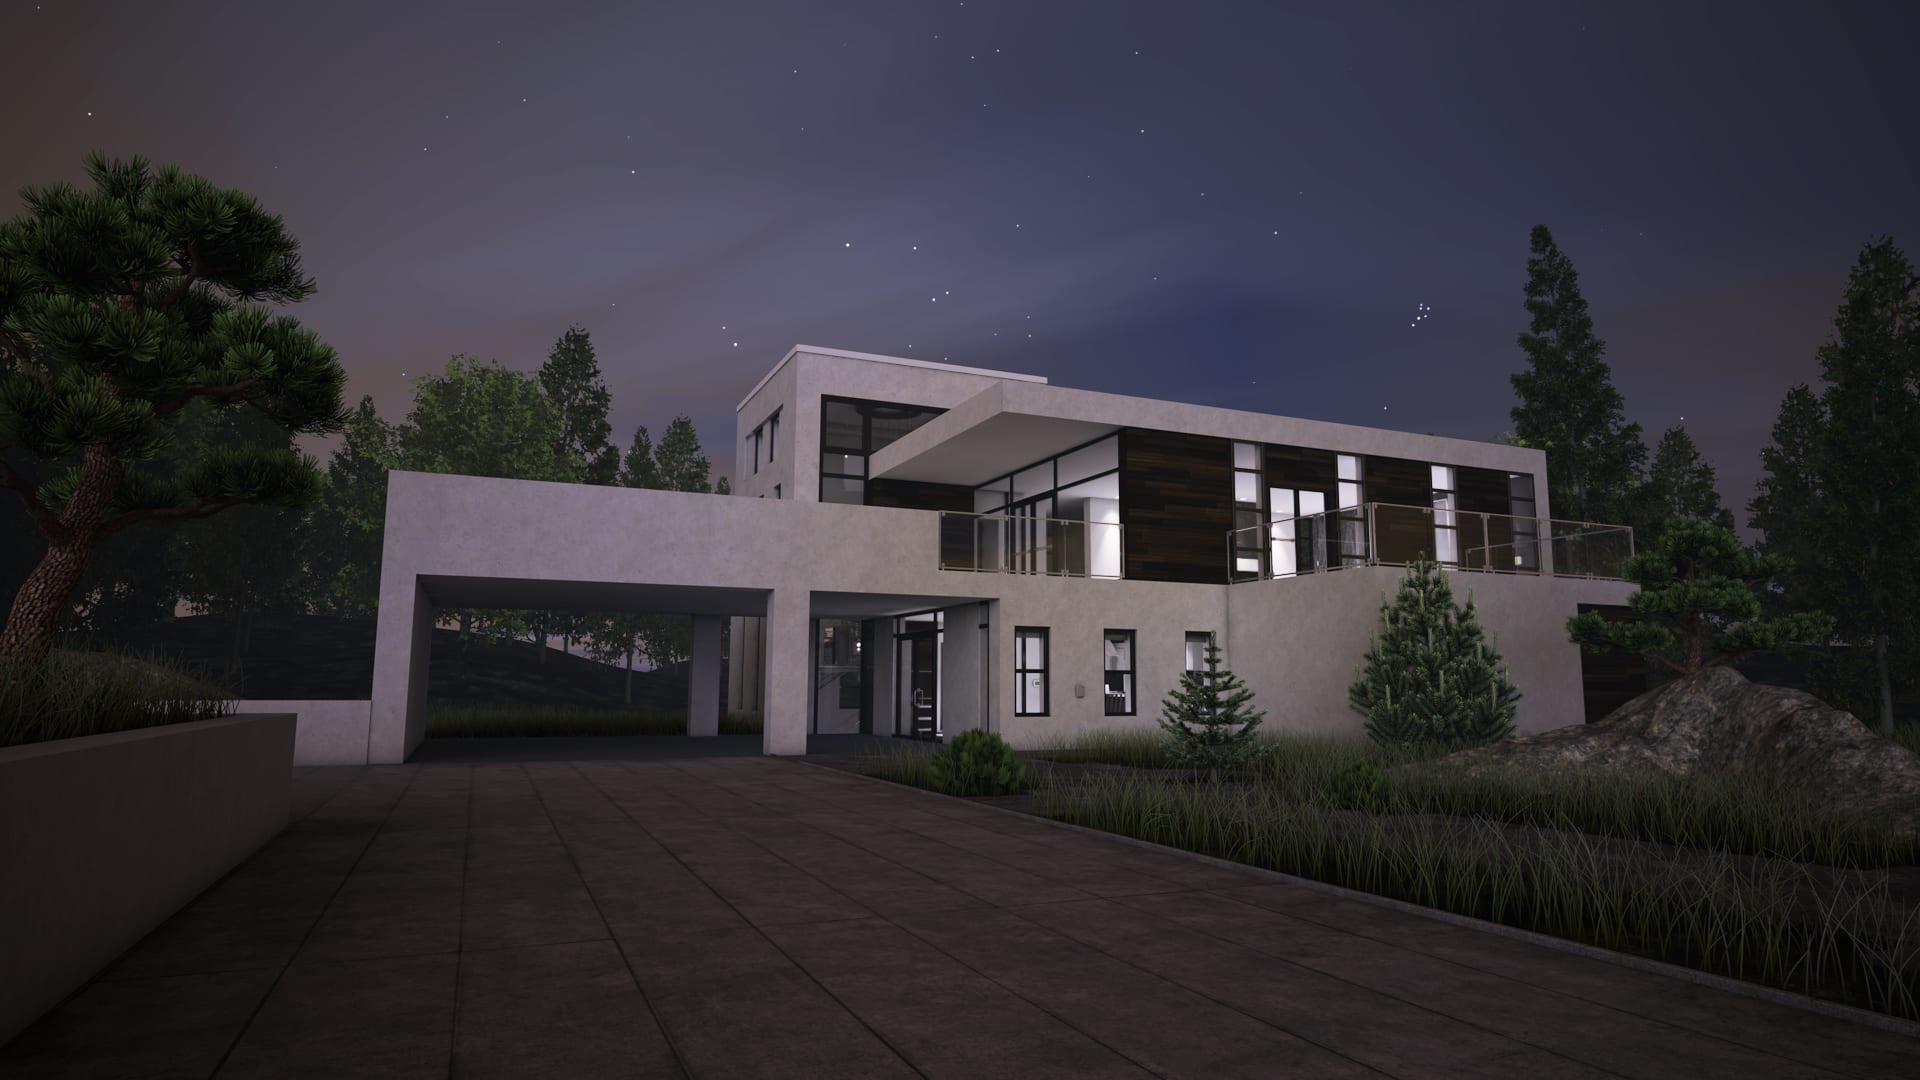 3D-Building-Exterior-Night